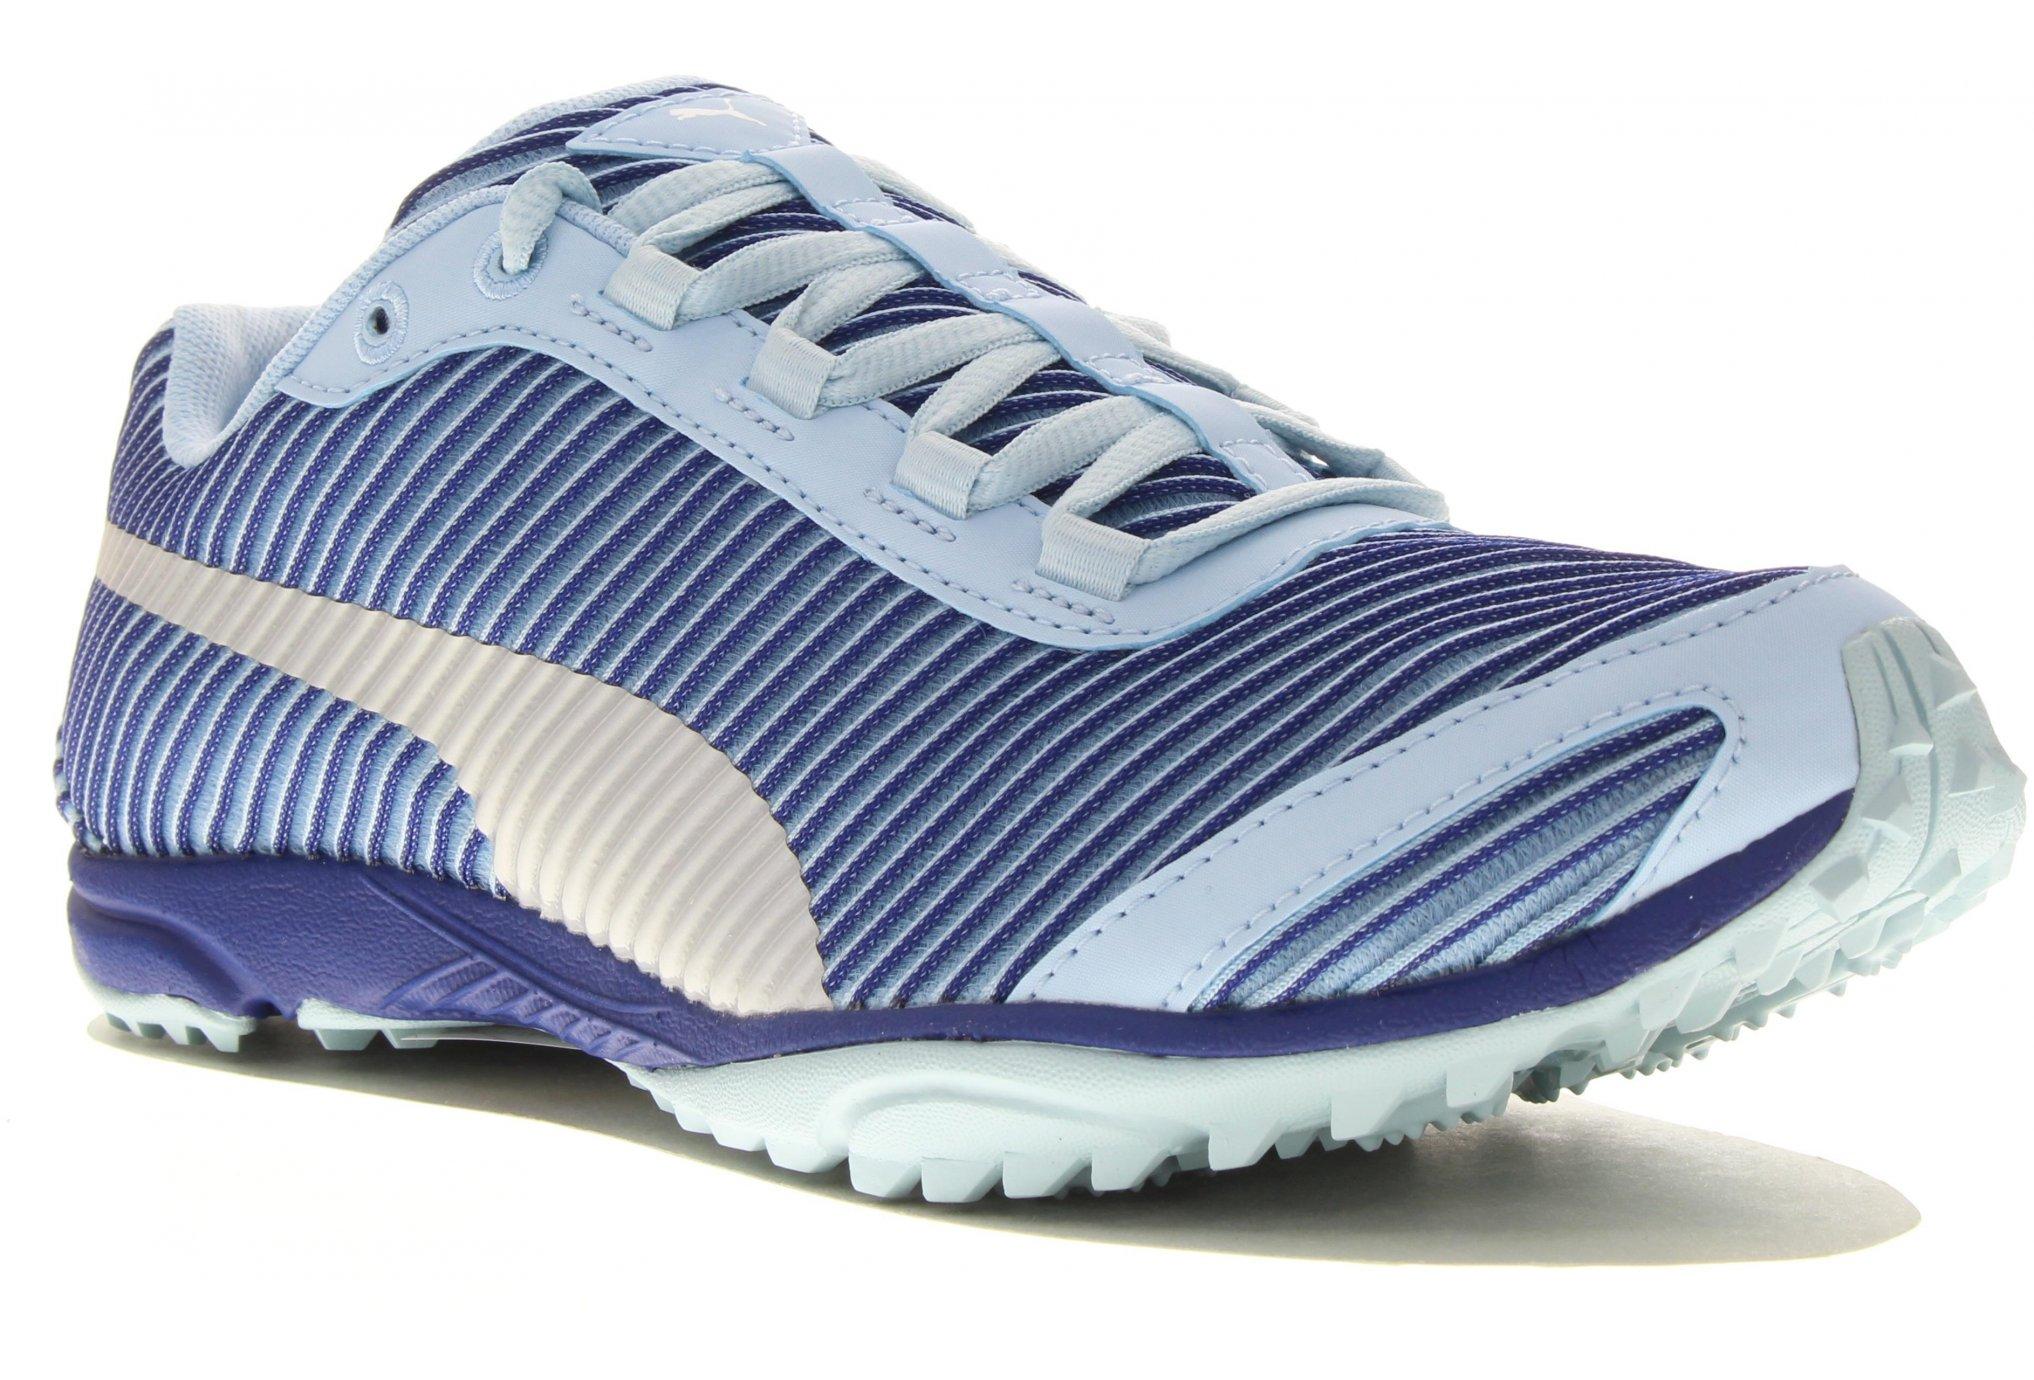 Puma EvoSpeed Haraka 5 W Diététique Chaussures femme